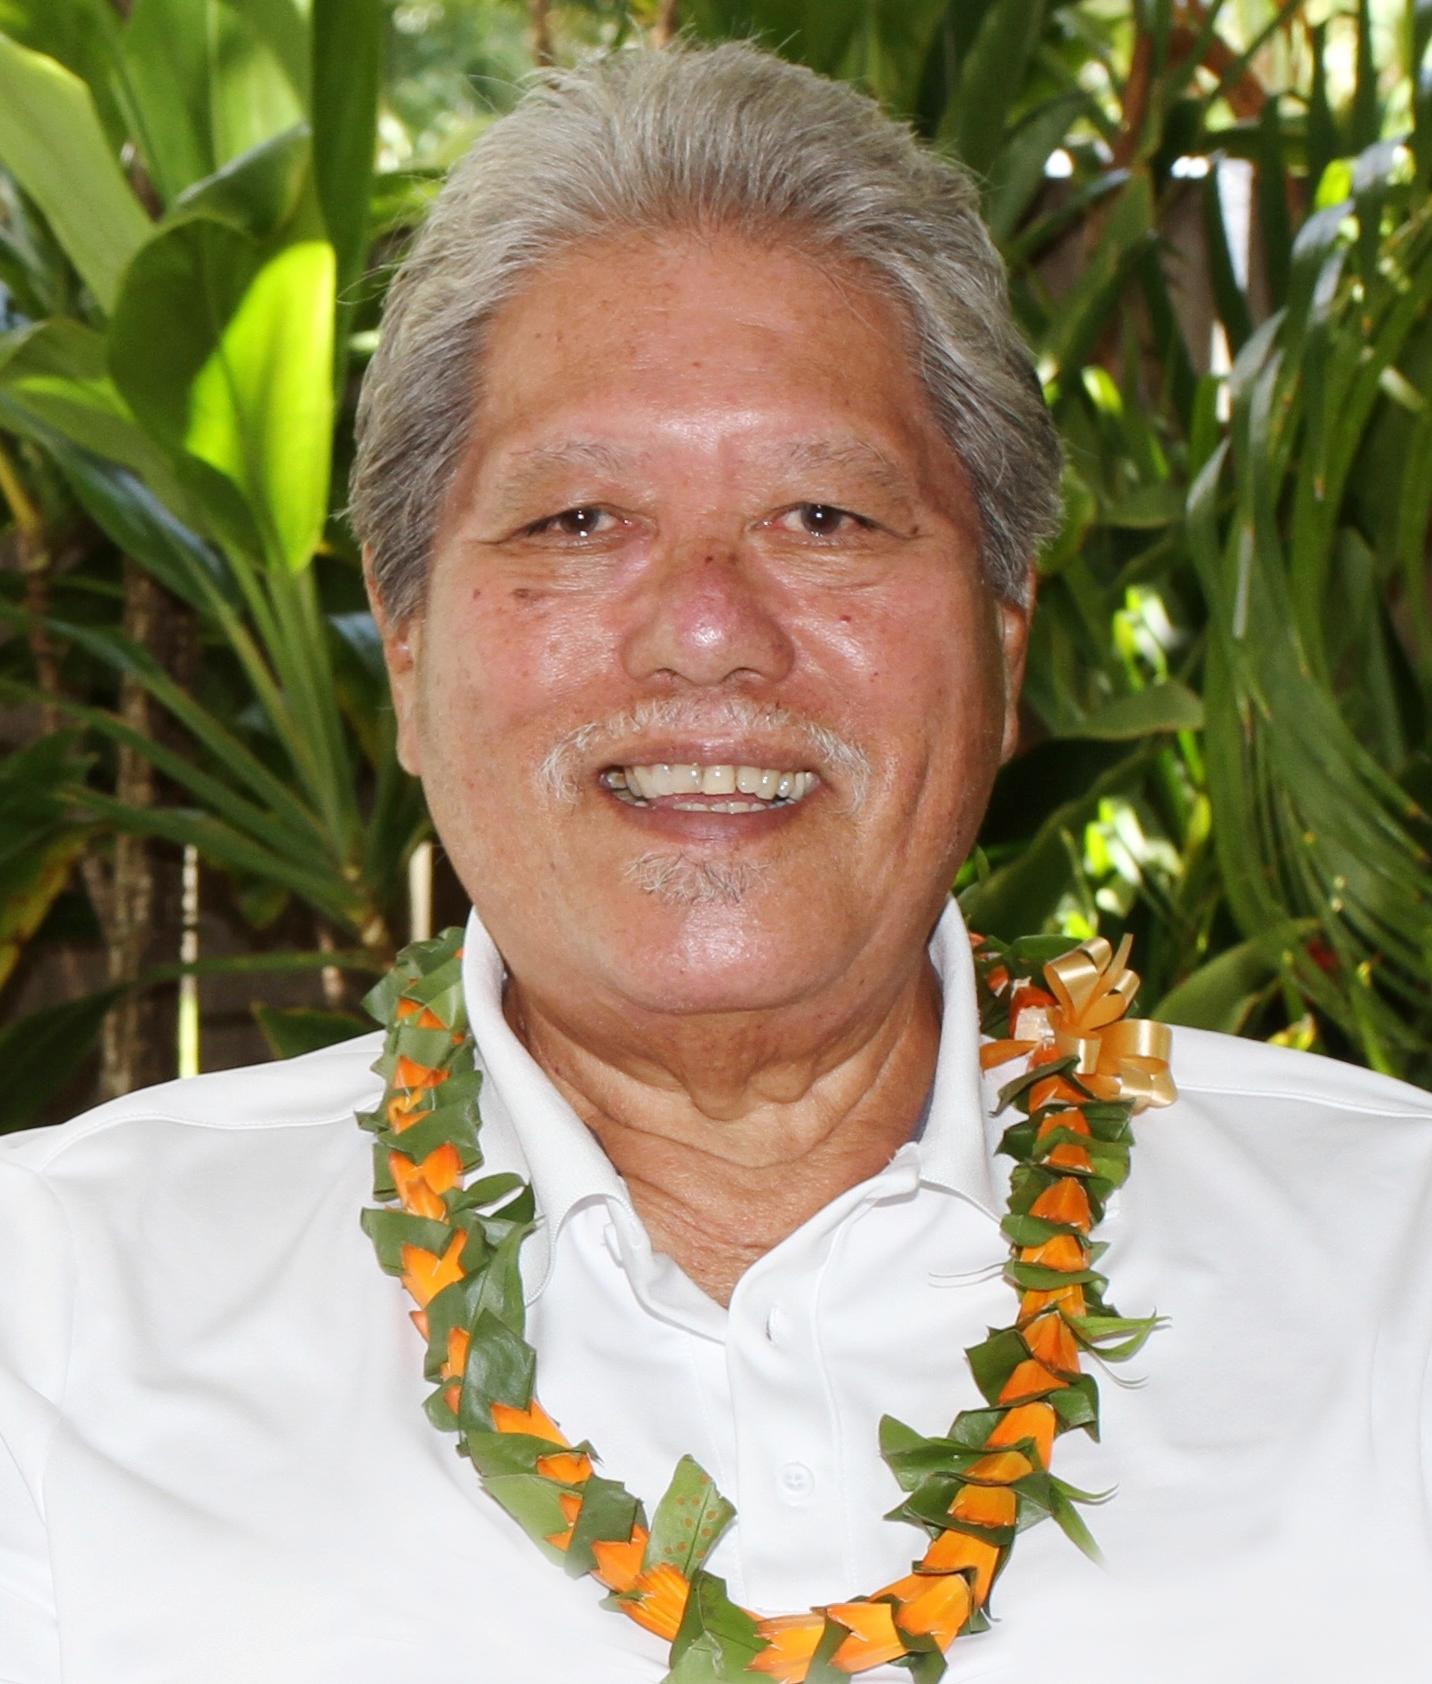 Arthur Paoa Kalamakai Medeiros